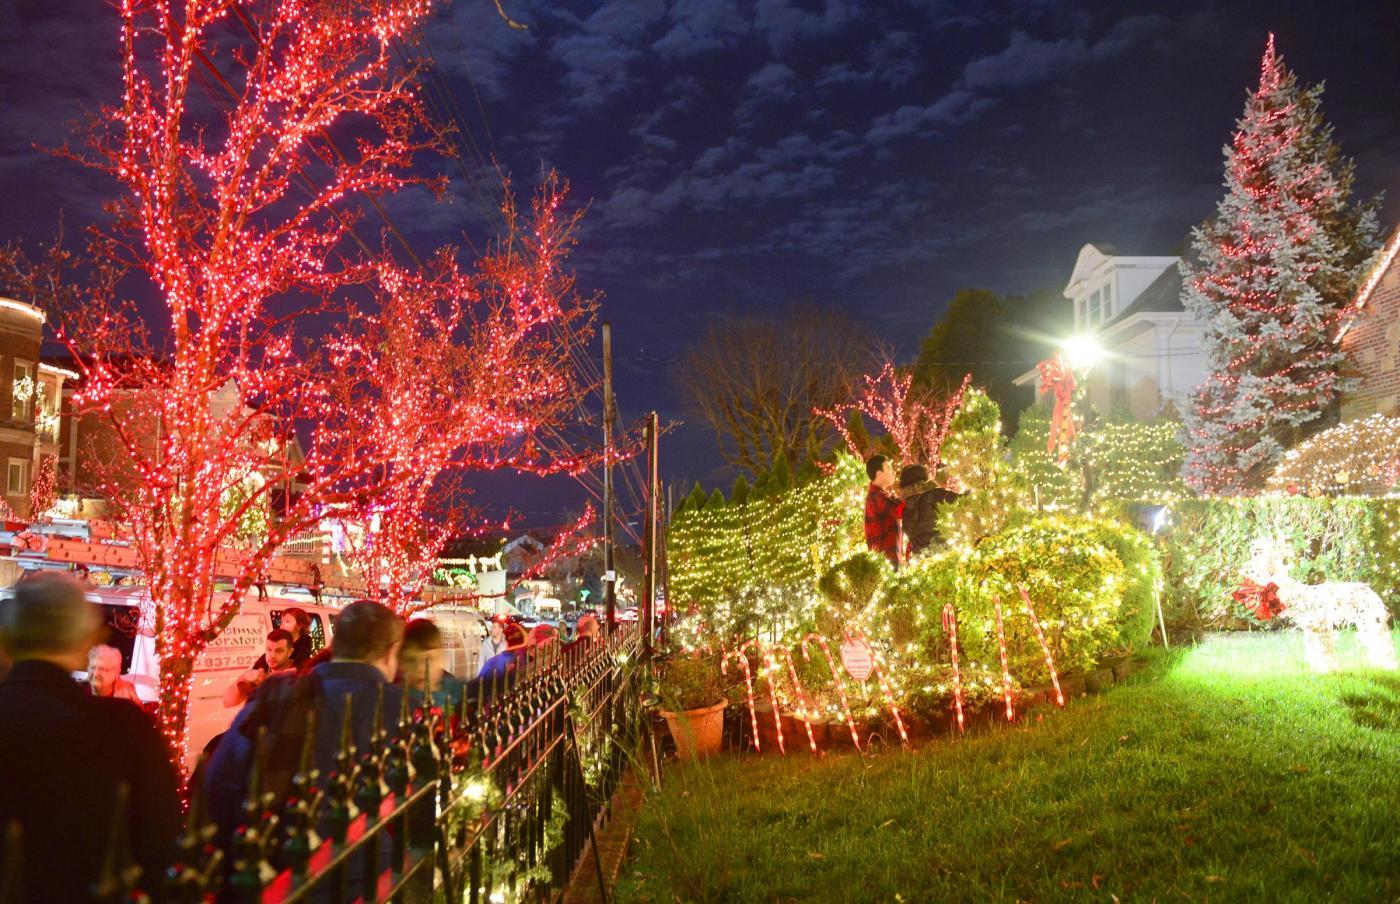 Maxi palline di natale da giardino - Addobbi natalizi da giardino ...